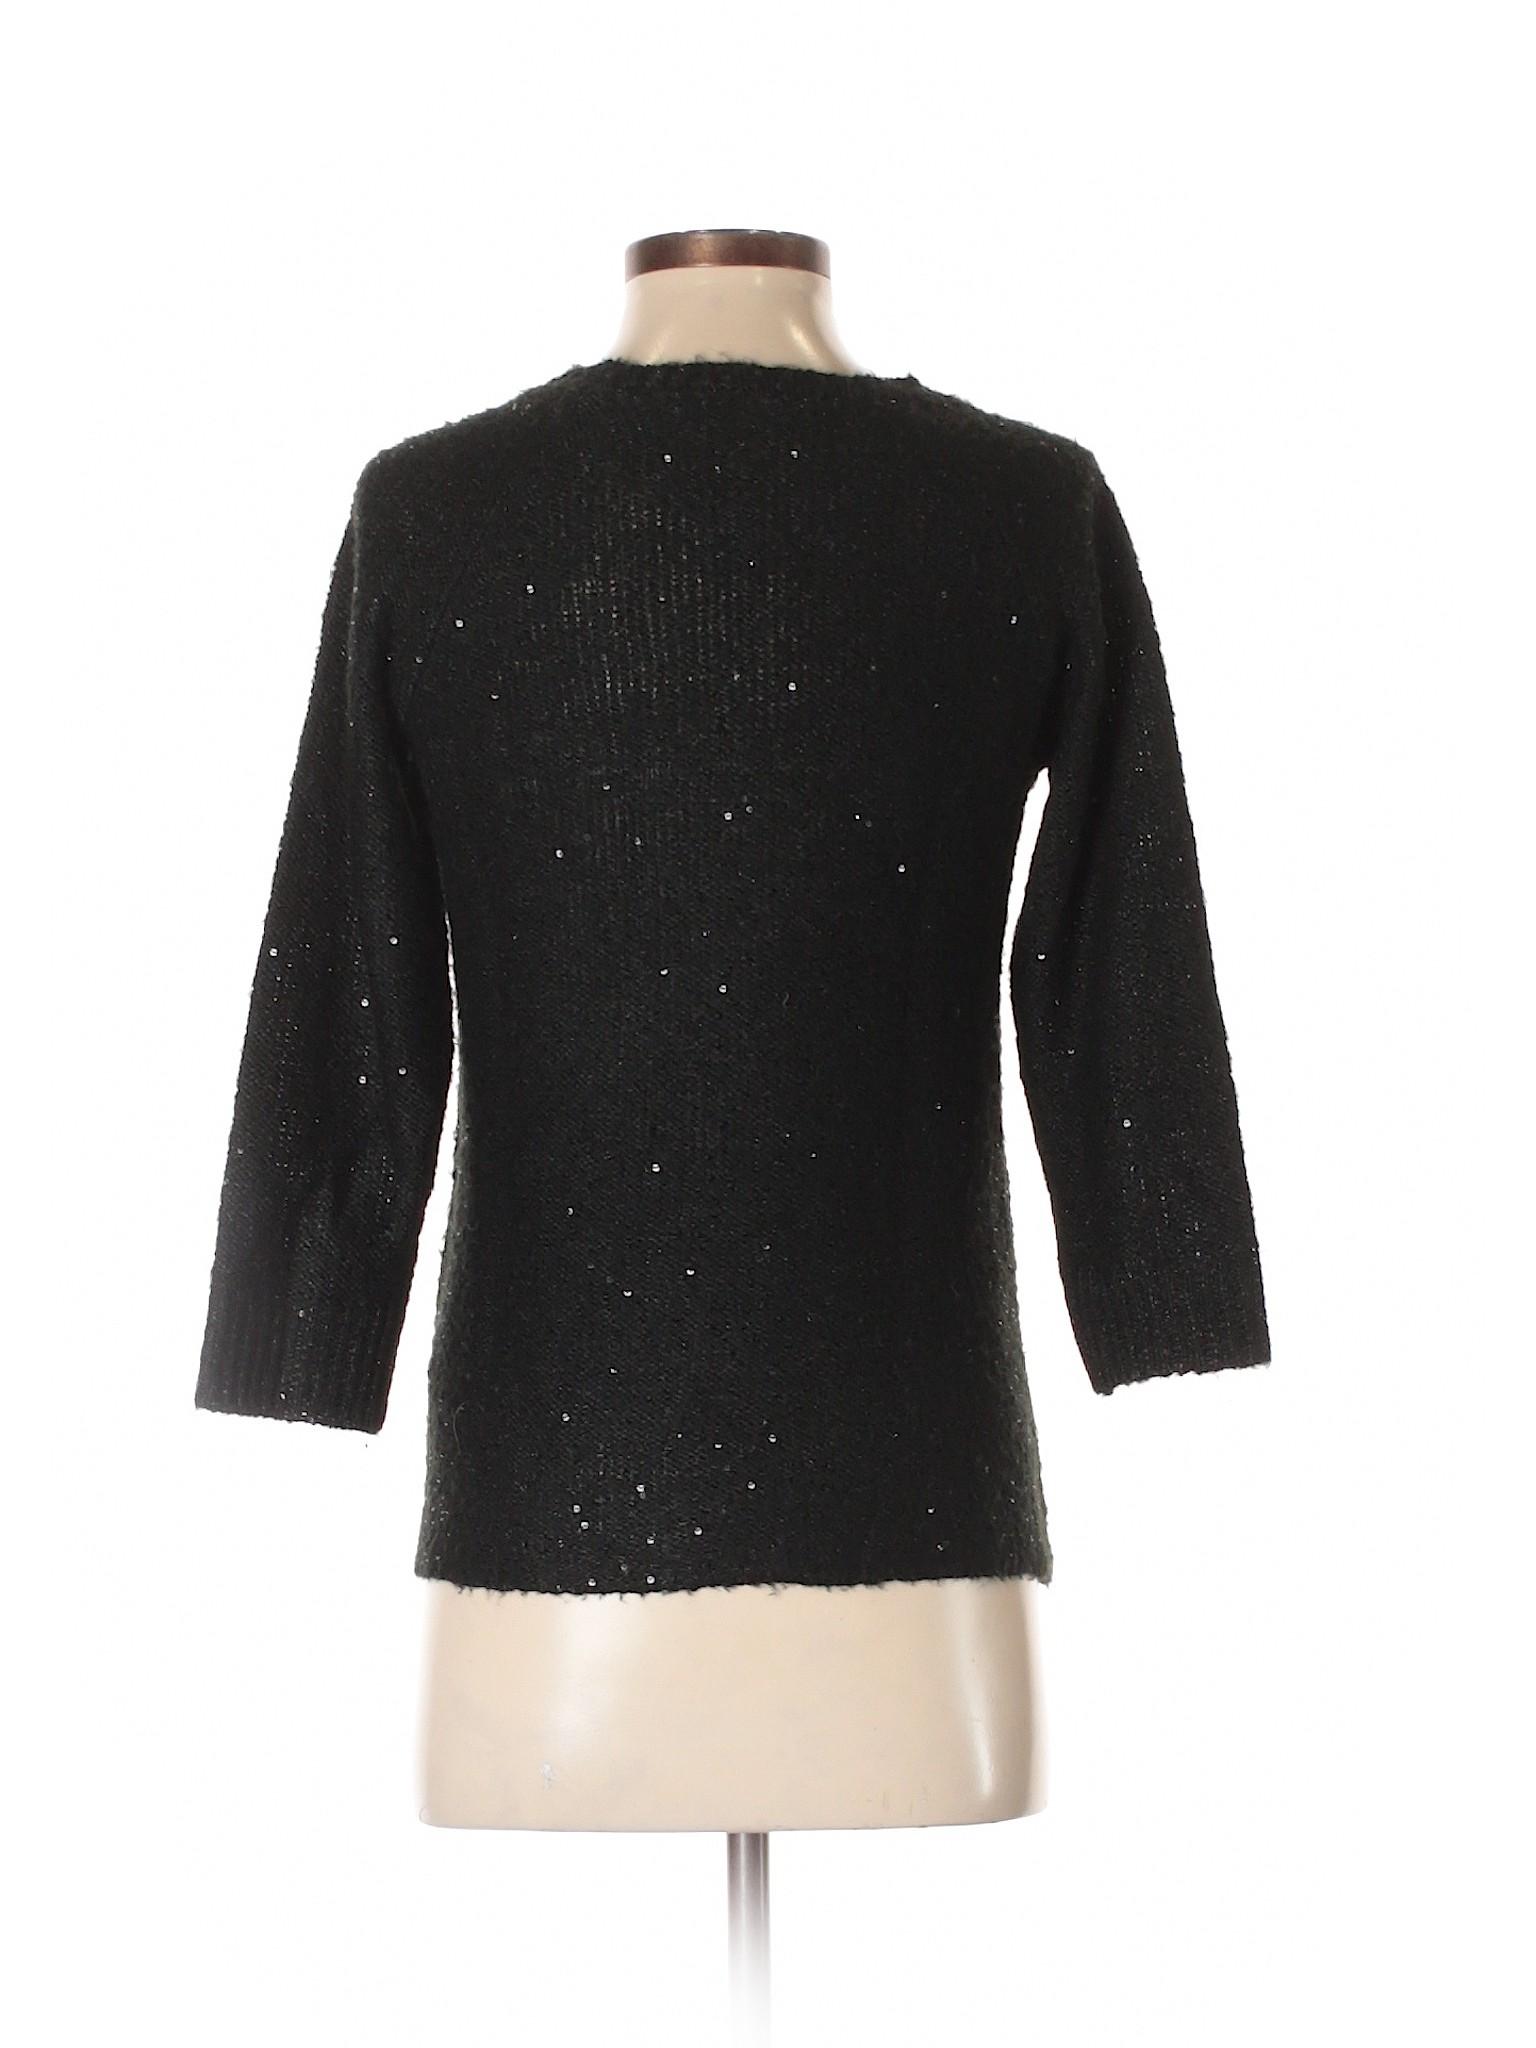 Boutique Pullover Anne Boutique Sweater Anne Klein dwxOIqT0